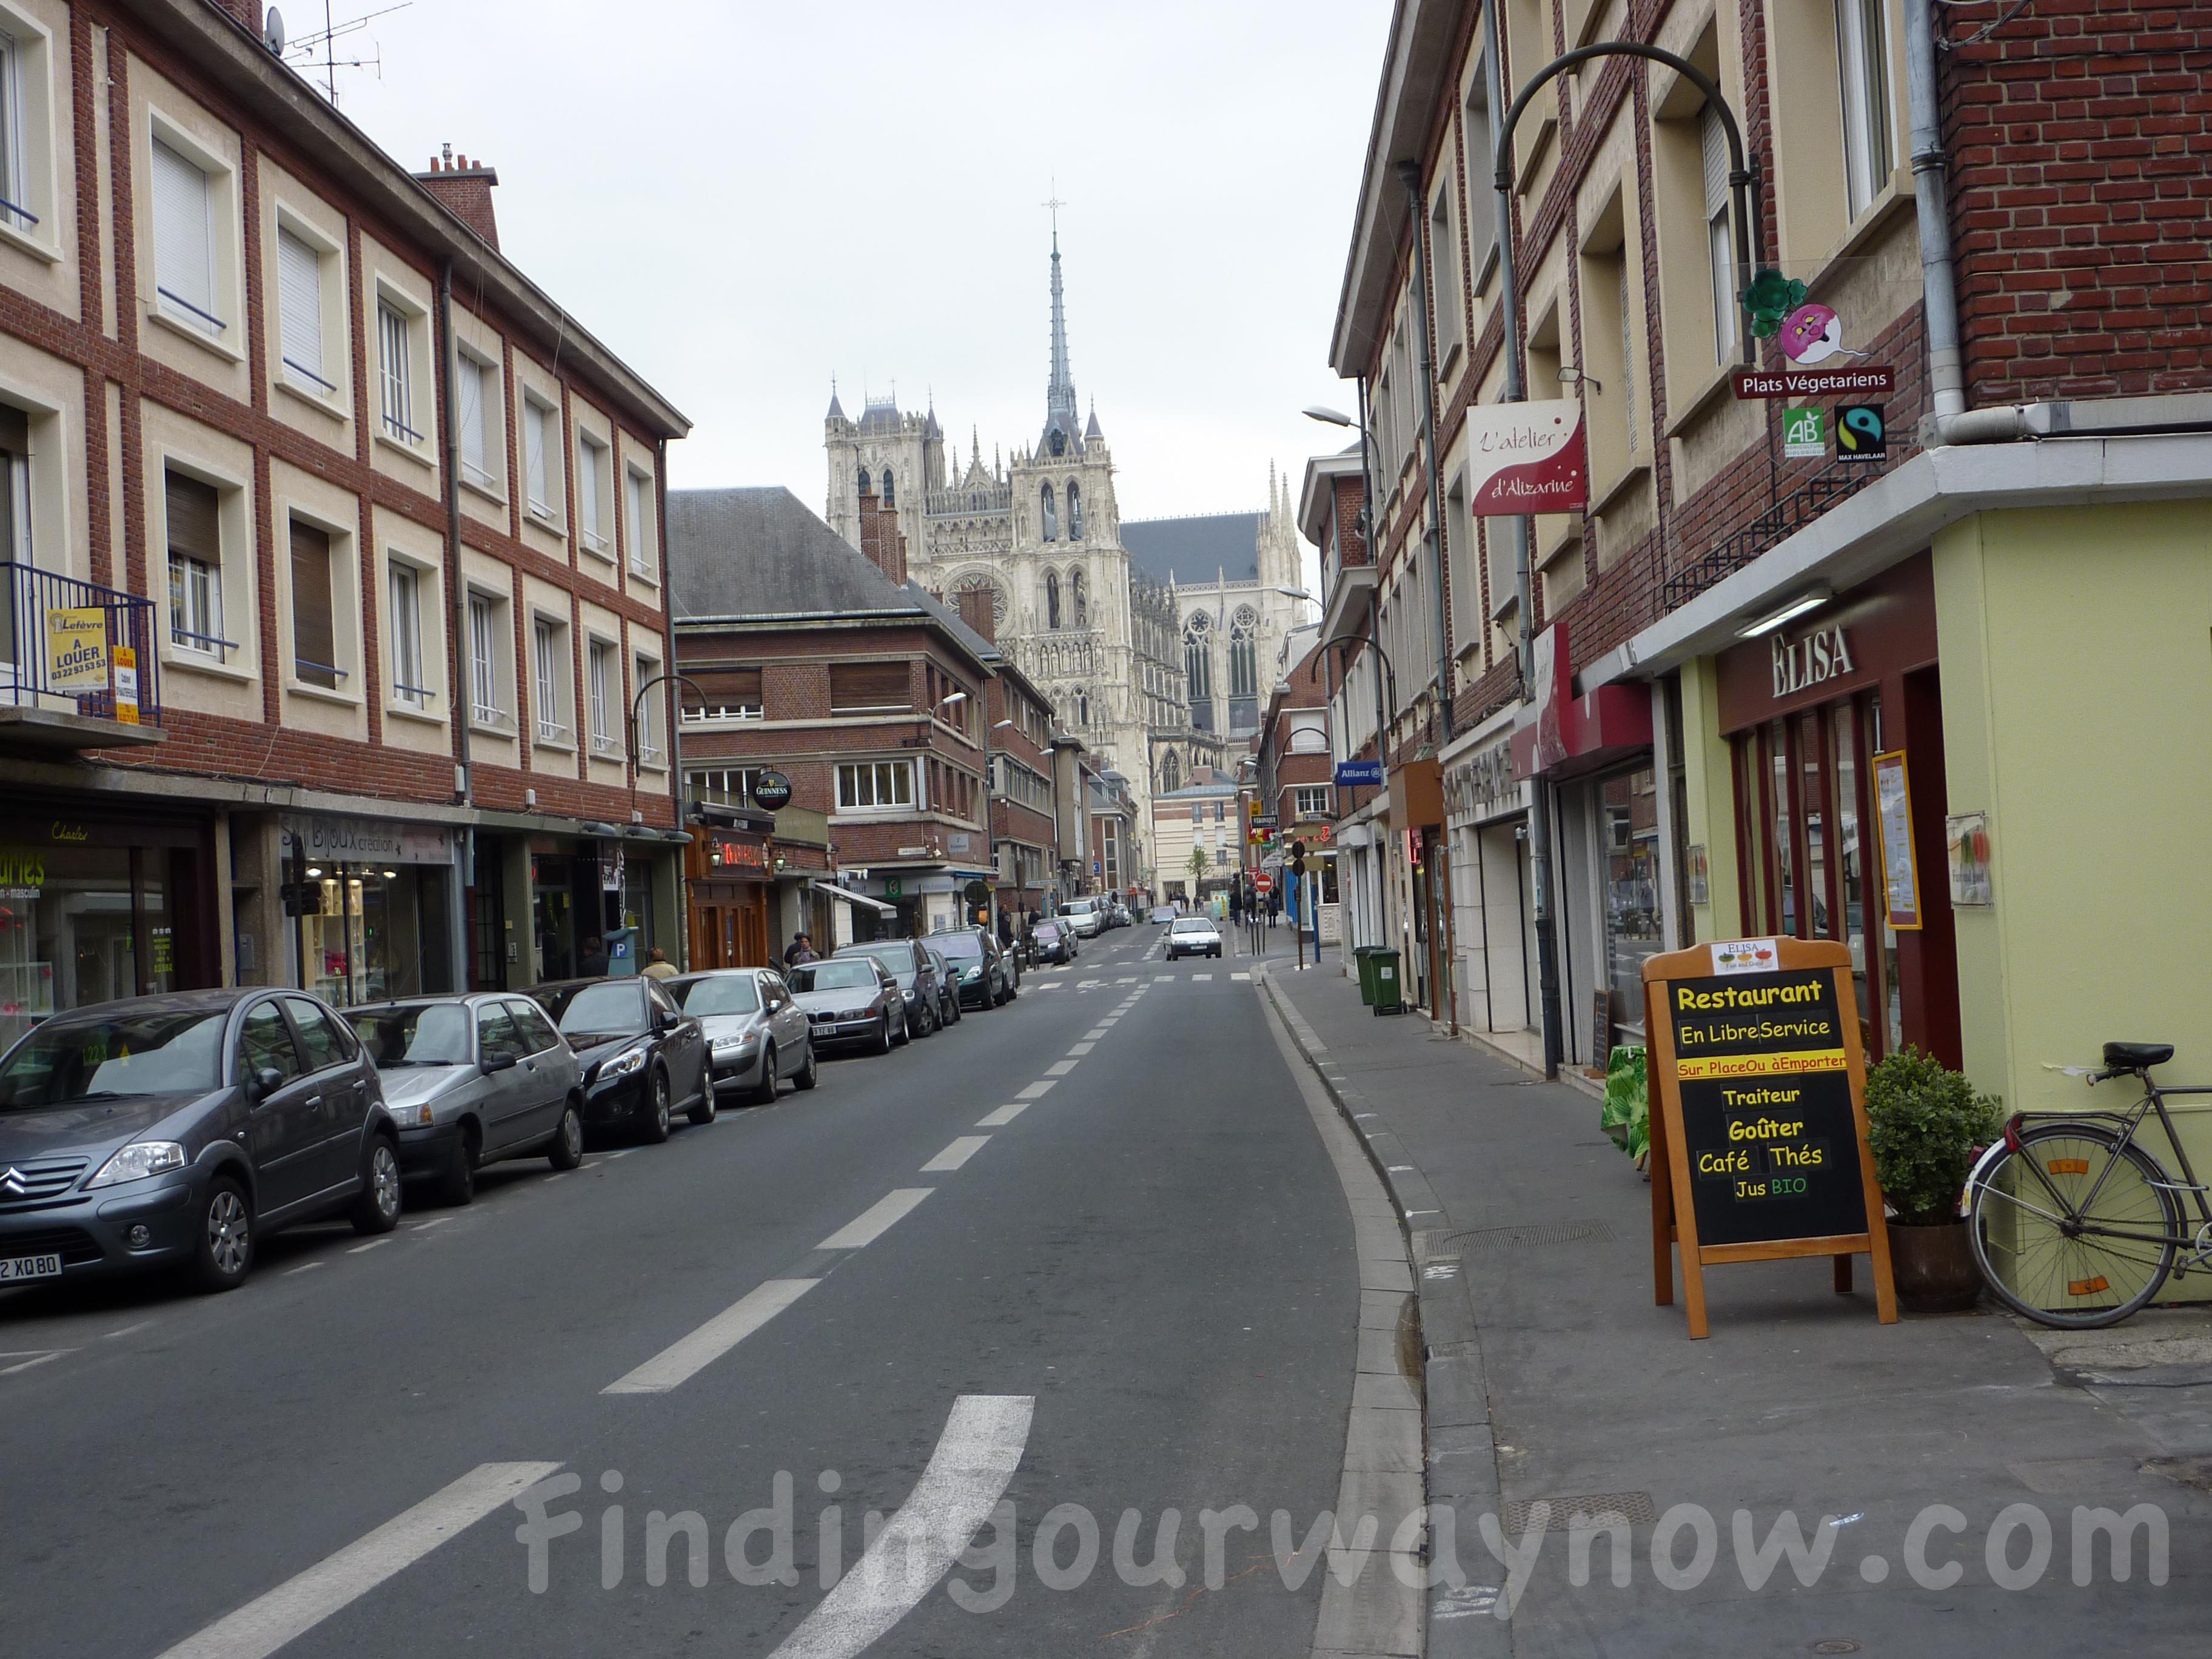 Sightseeing in France - Week 1 , findingourwaynow.com